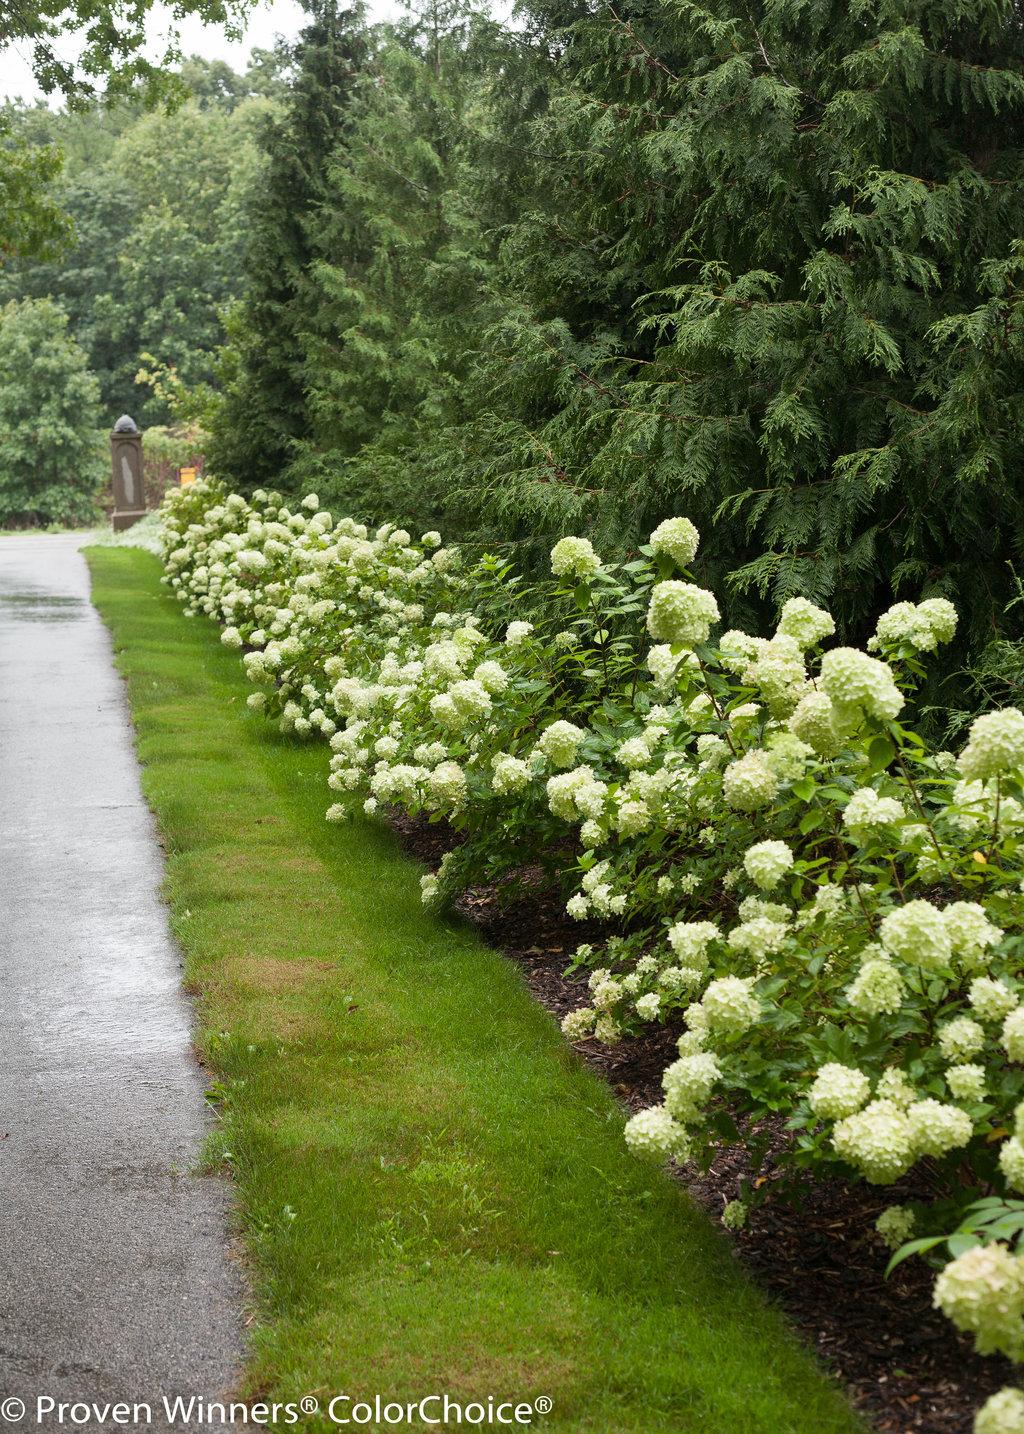 Little Limeu00ae - Panicle Hydrangea - Hydrangea paniculata Images : Proven Winners